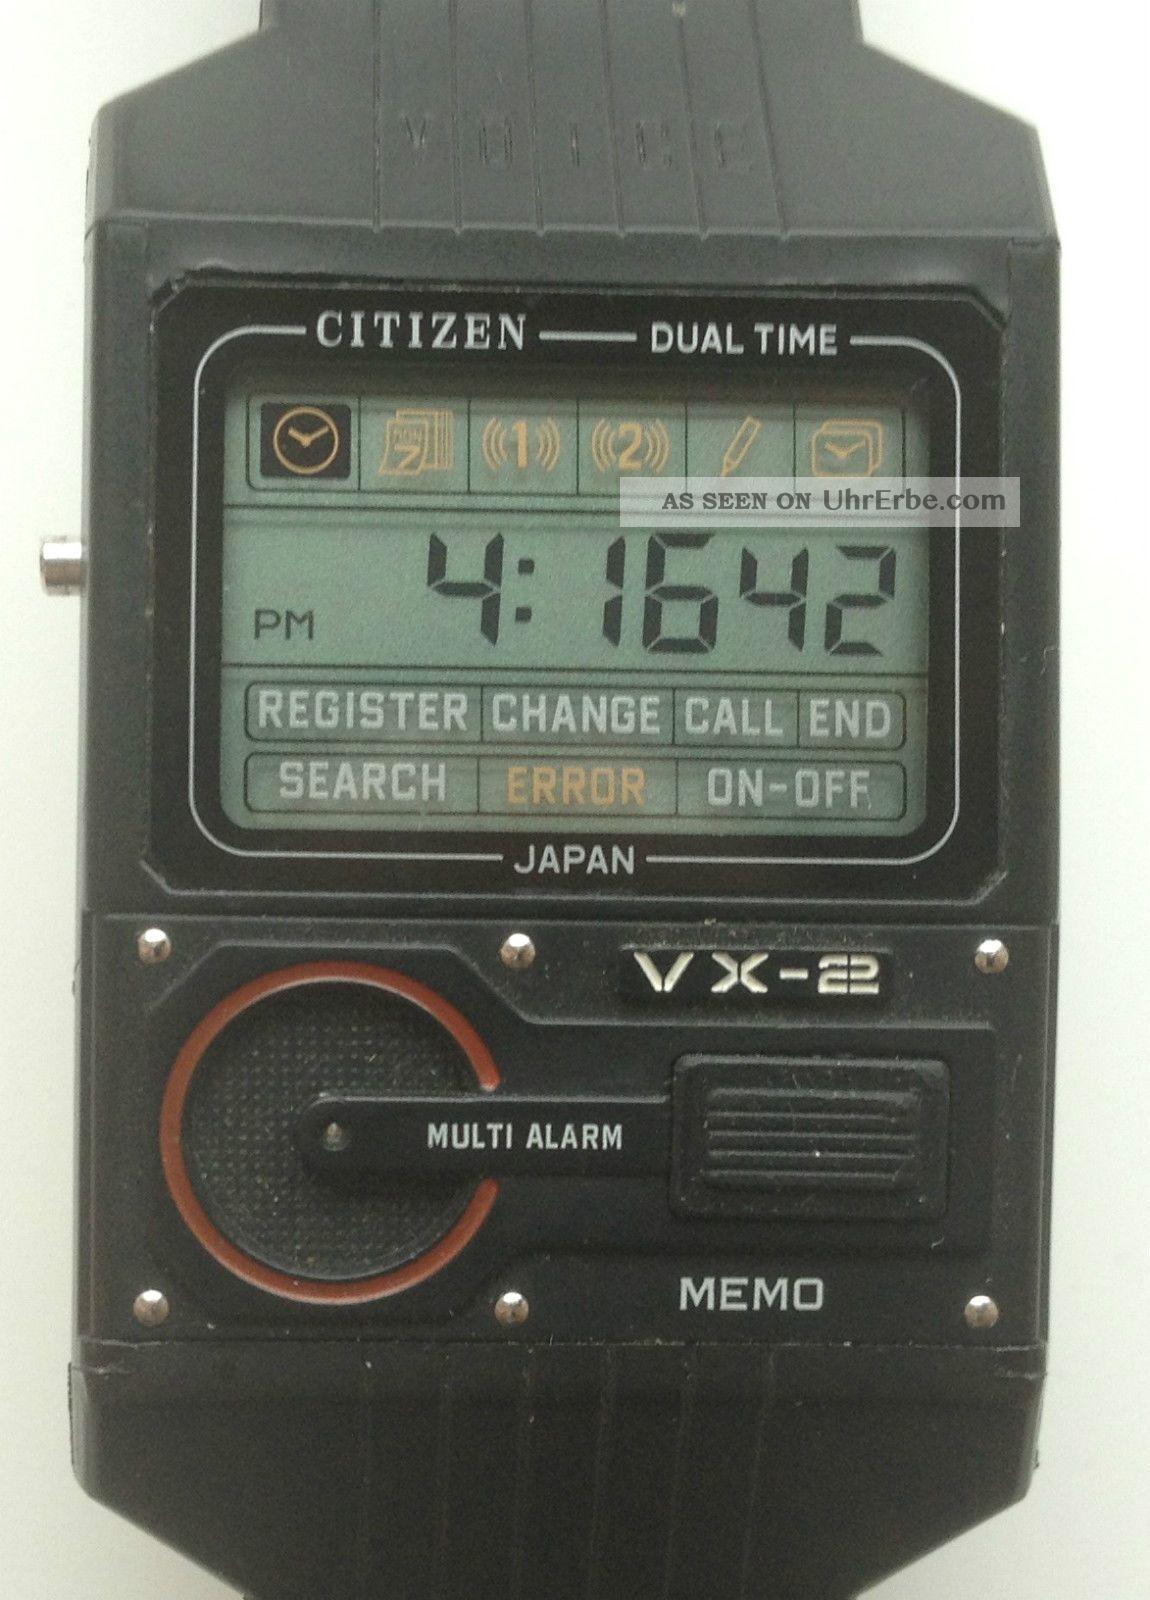 Citizen Vx - 2 Memo Voice Sprachsteuerung Digital Uhr Armbanduhr Rar Selten Armbanduhren Bild